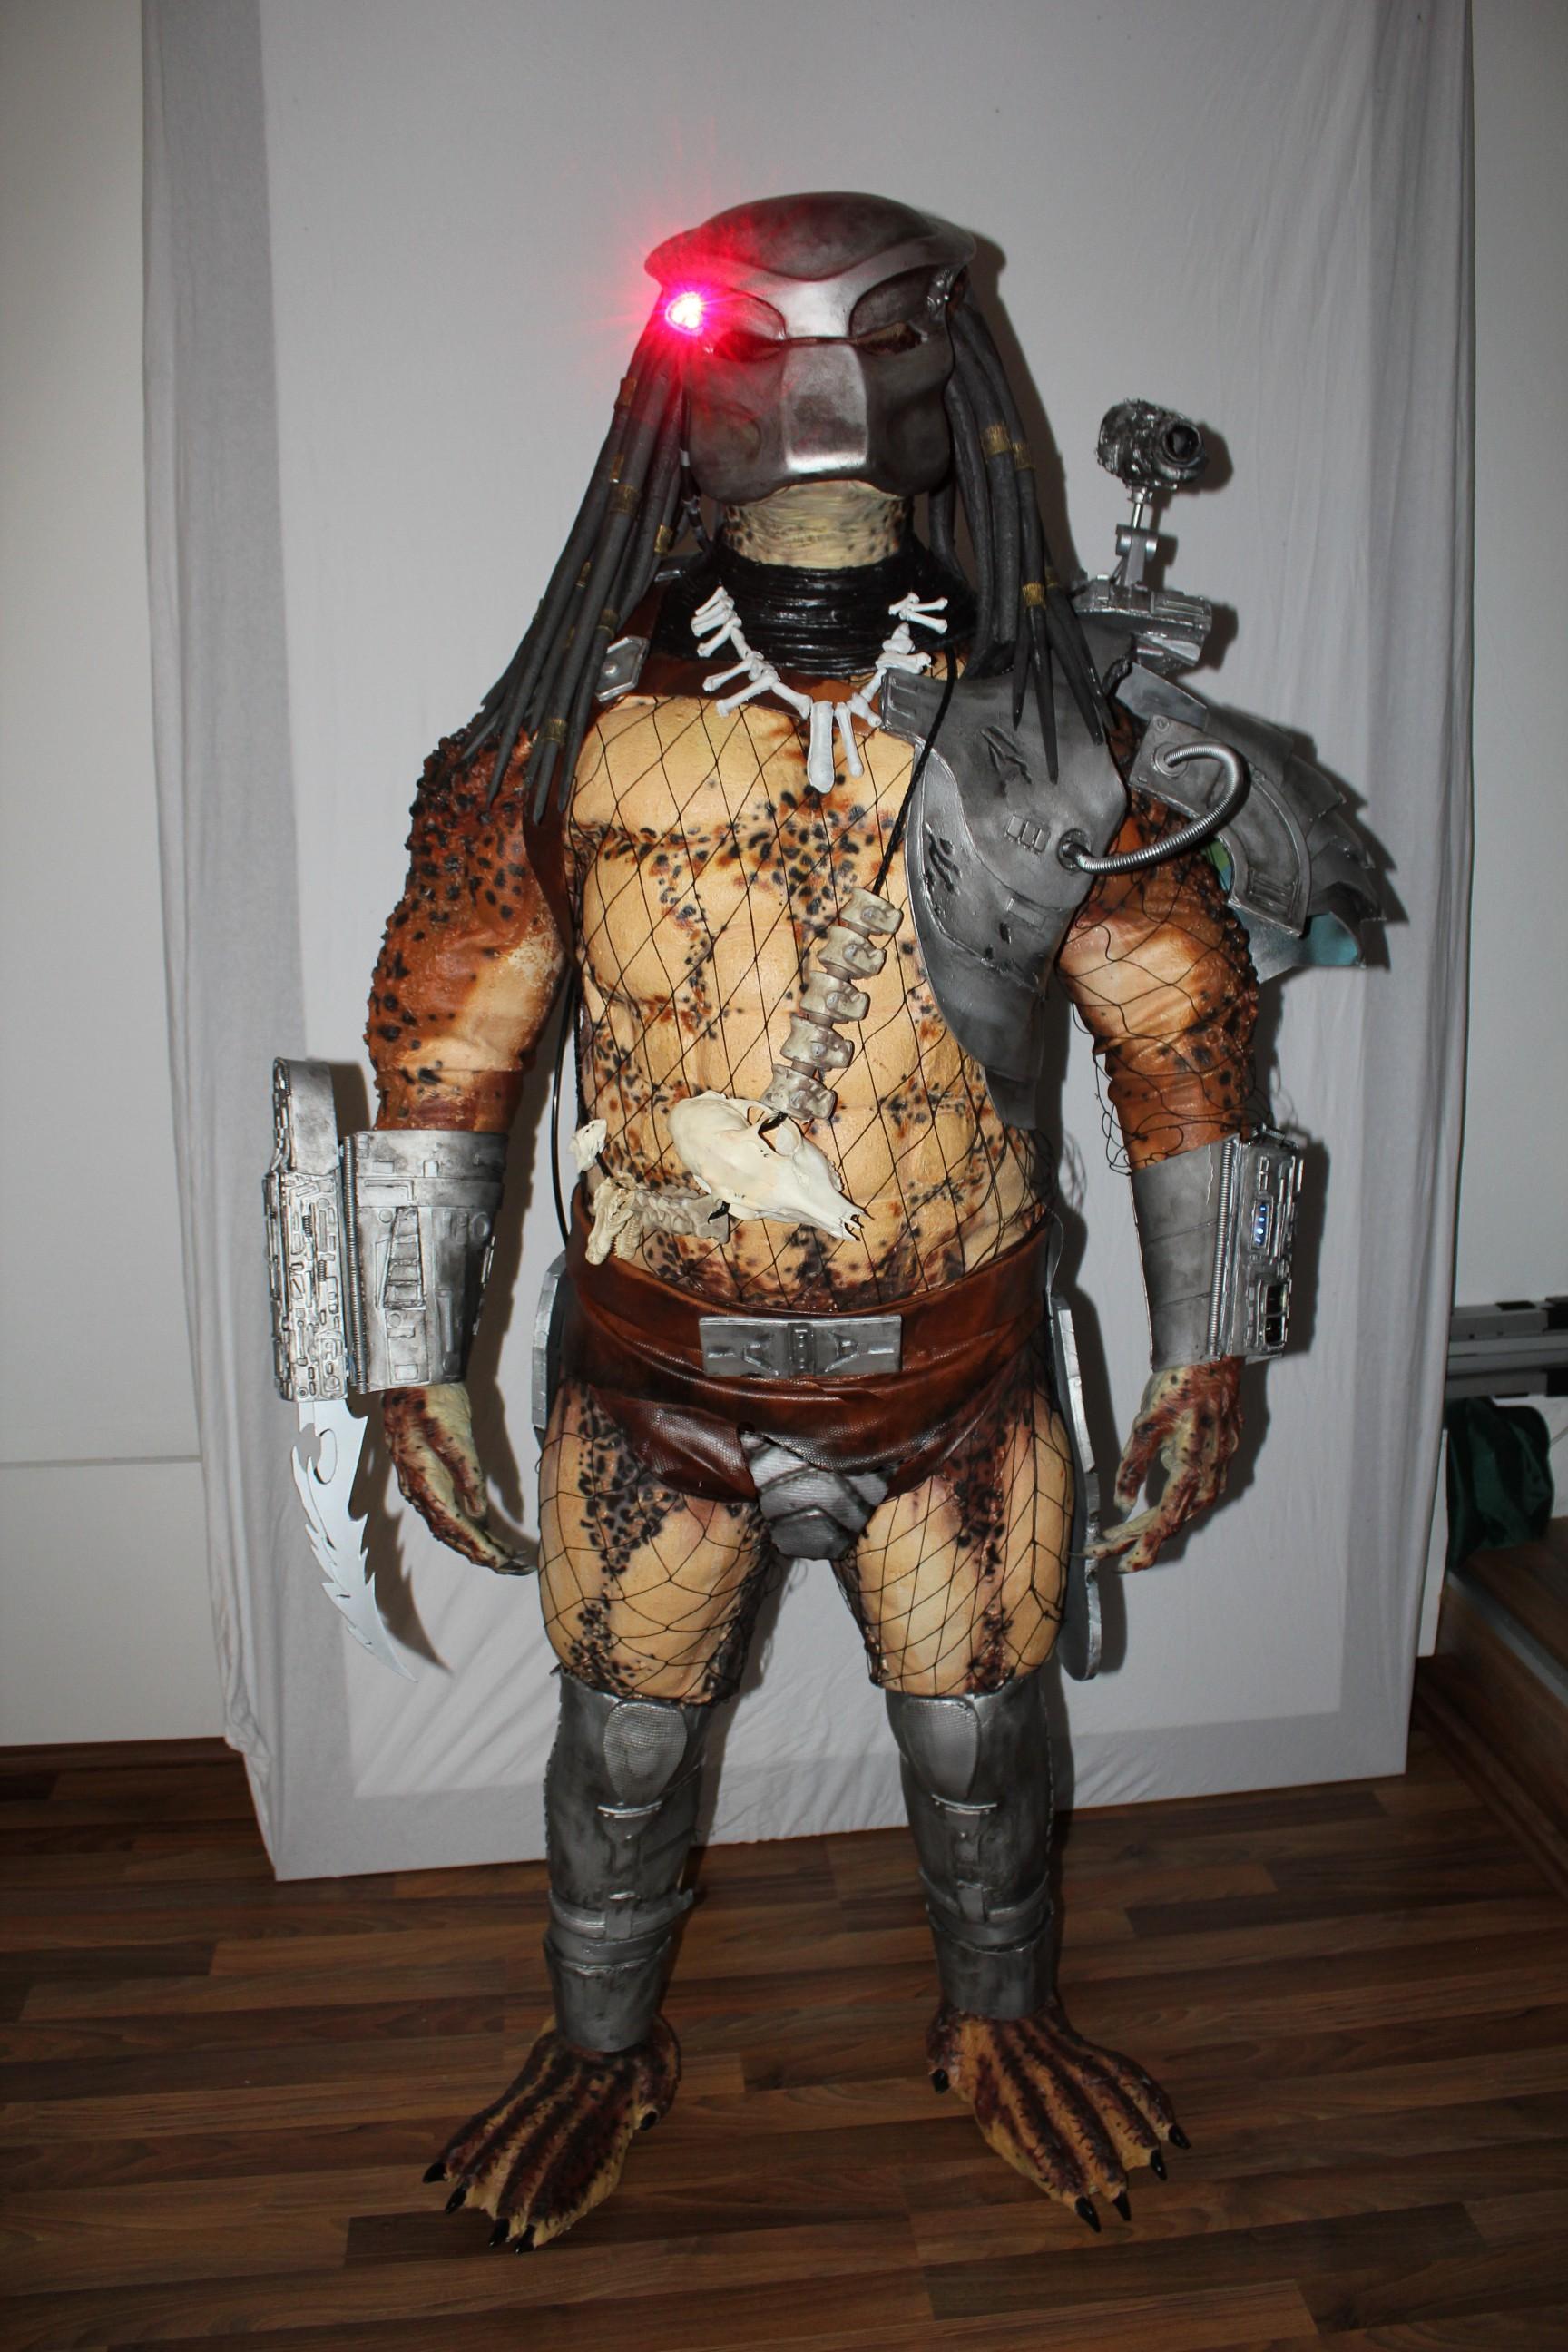 Predator_NeXus6_Helmet_2_sml.JPG